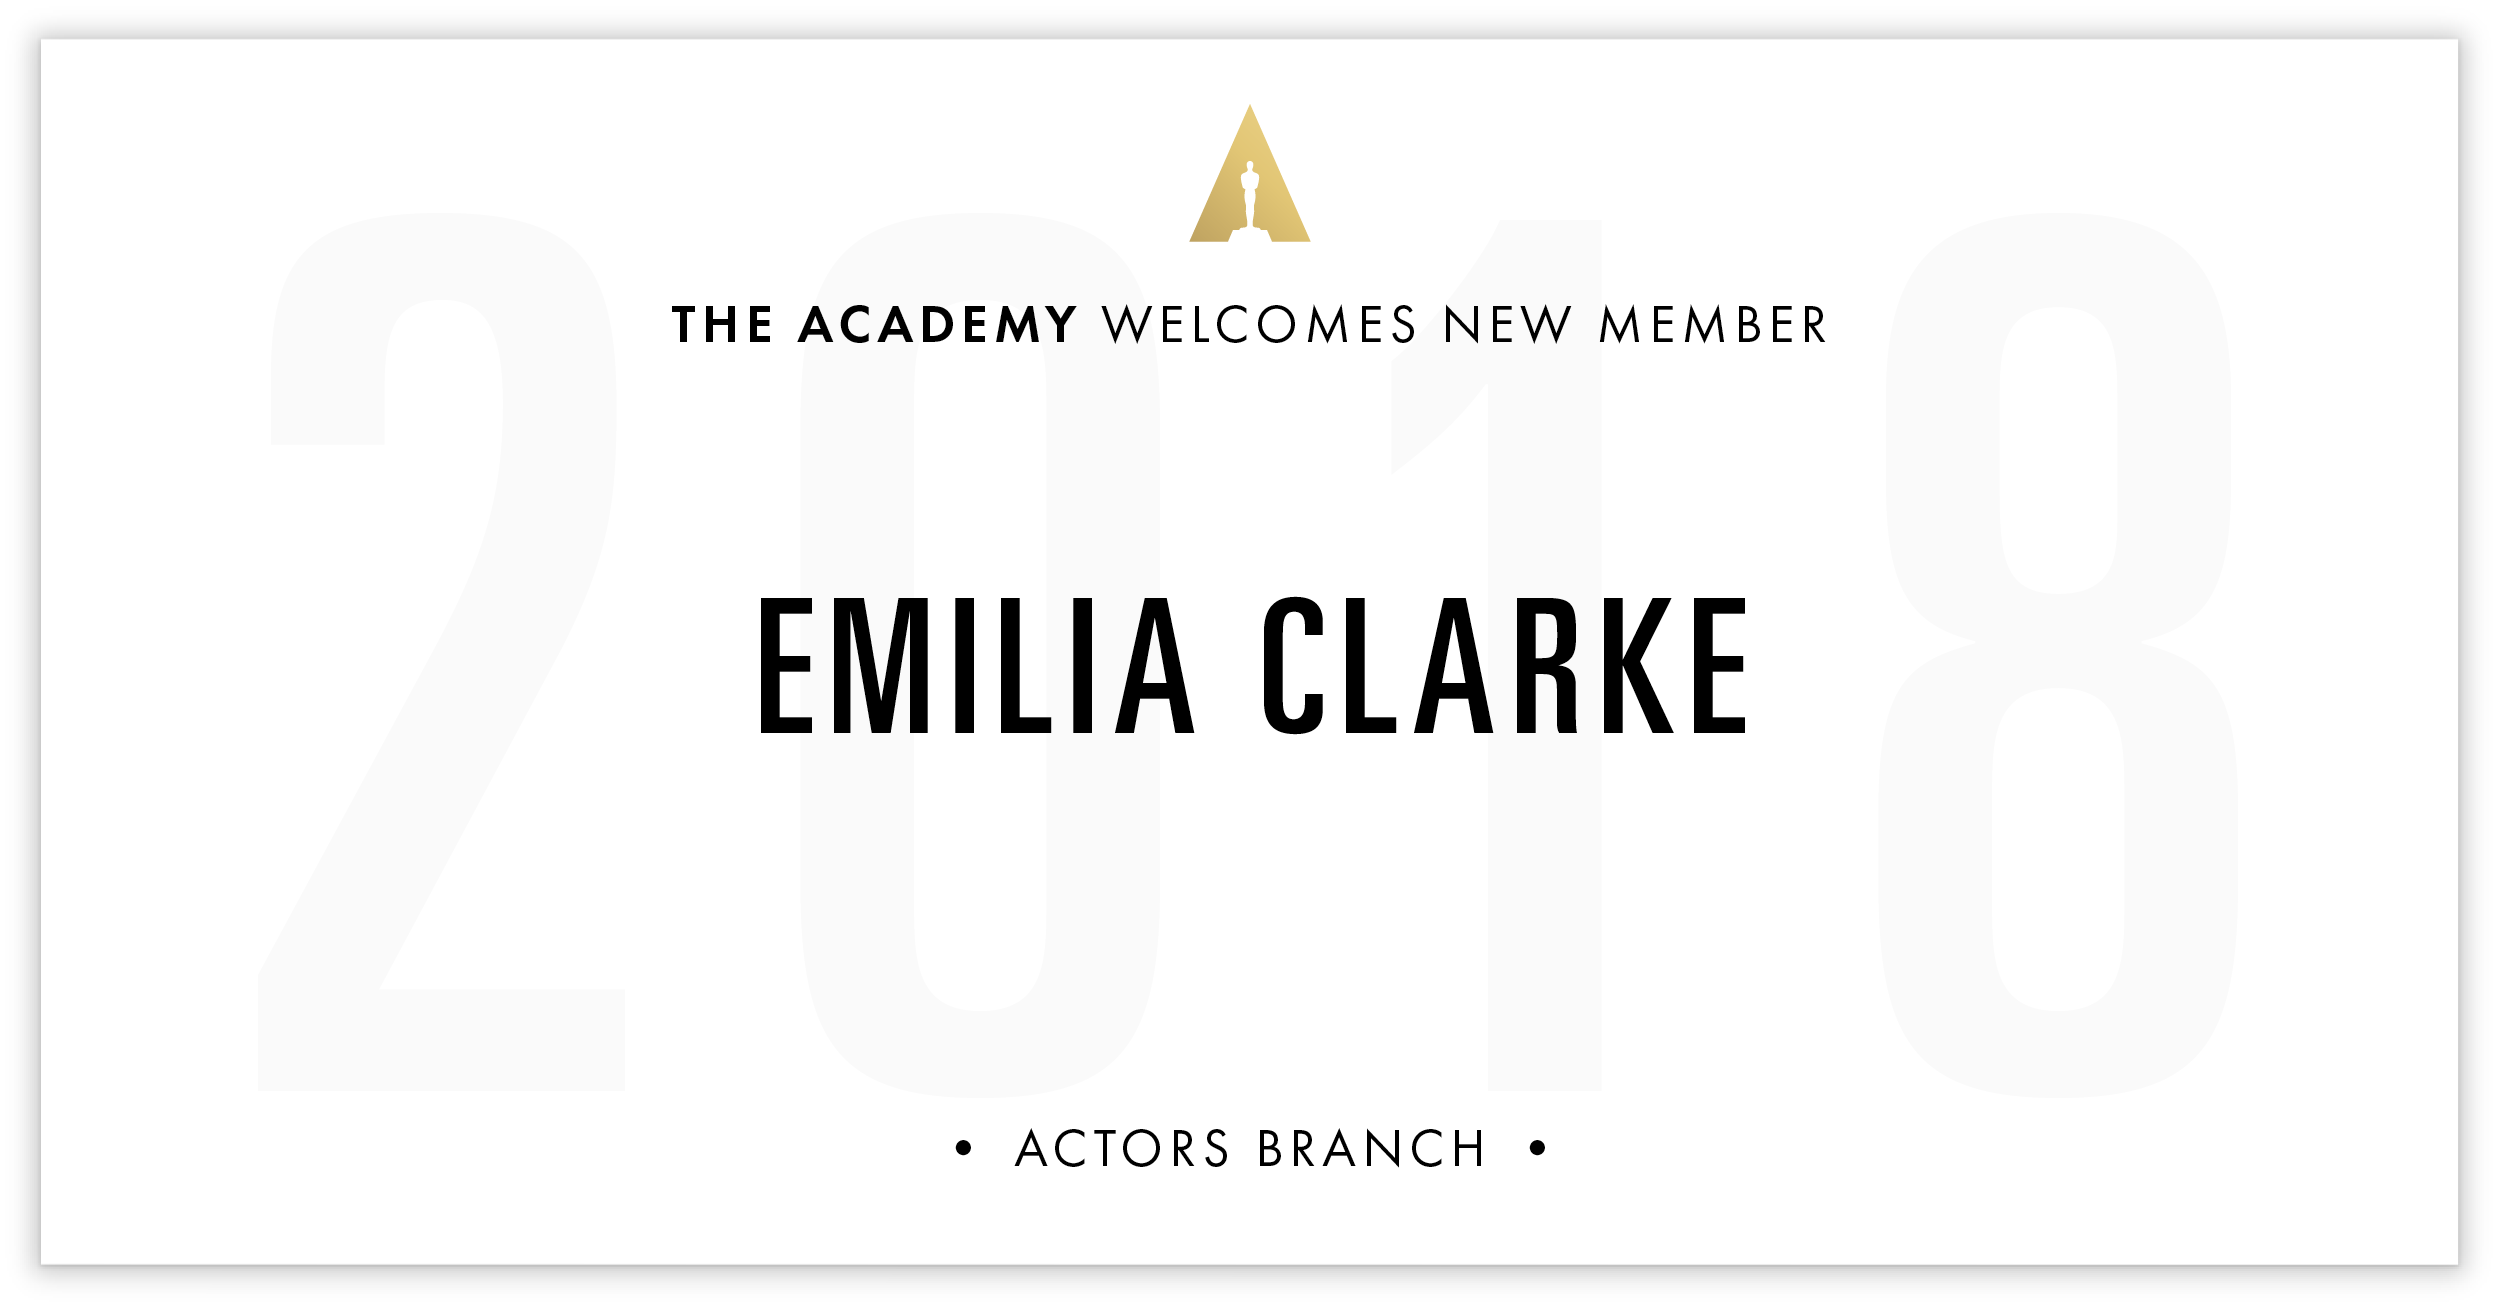 Emilia Clarke is invited!